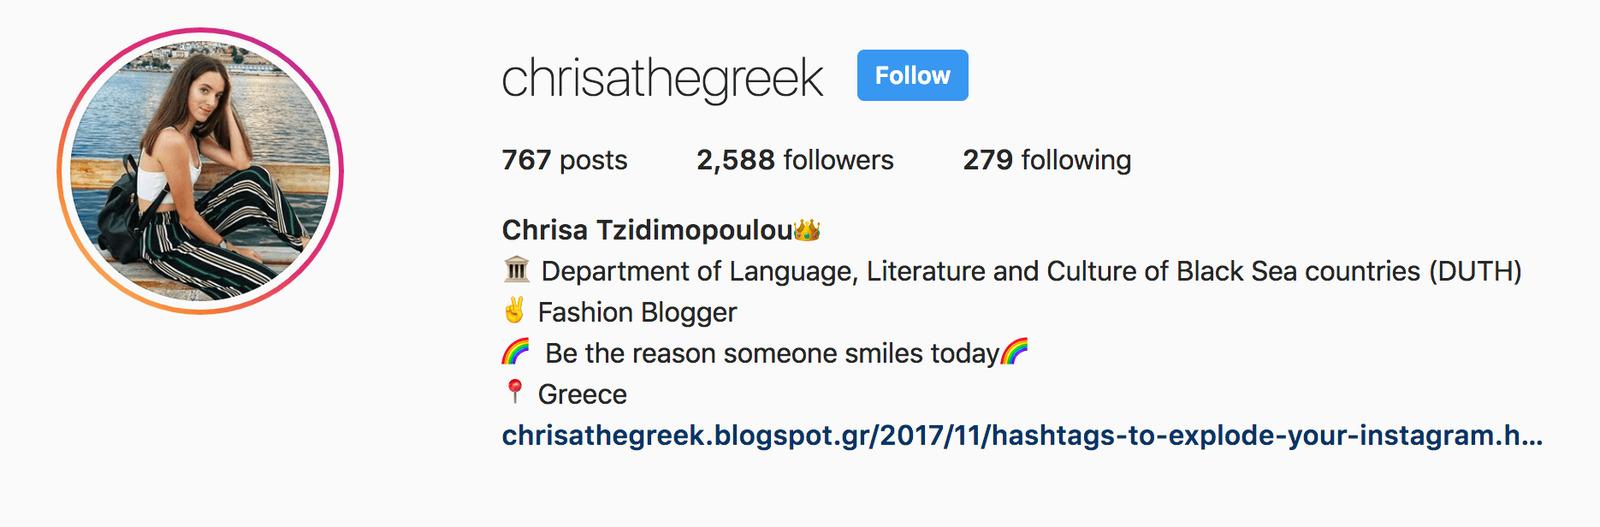 instagram-bio-for-fashion.png